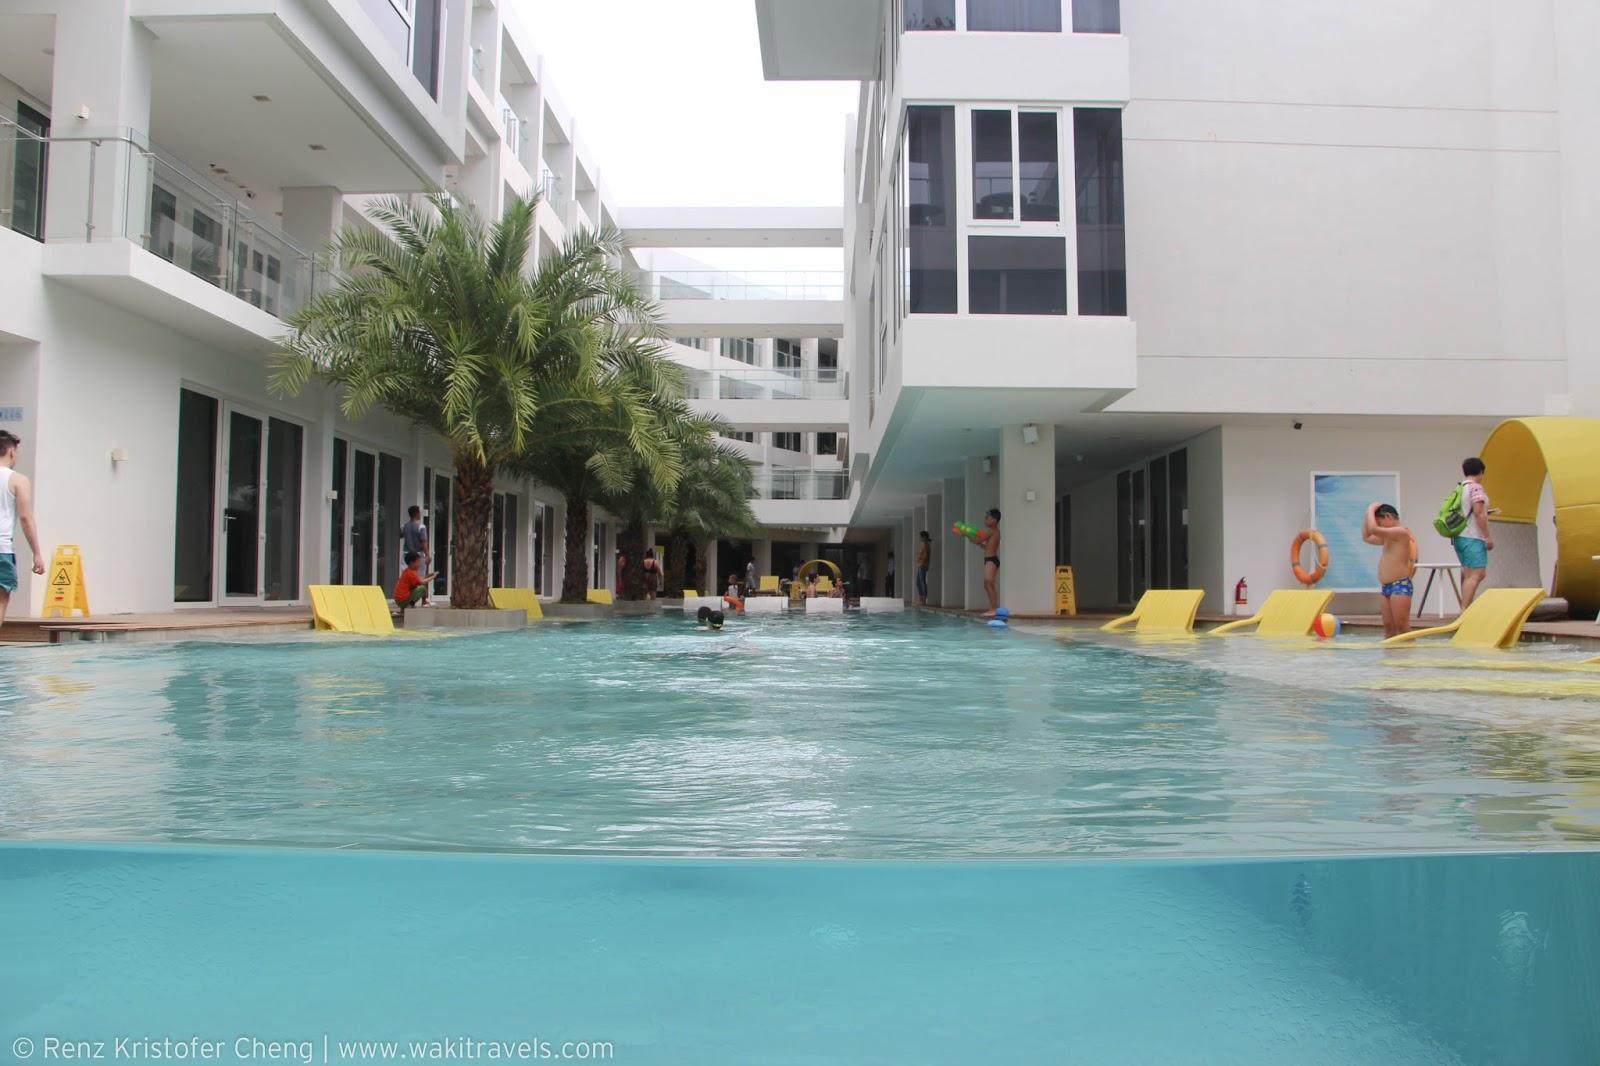 Astoria Current Hotel In Station 3 Boracay Island